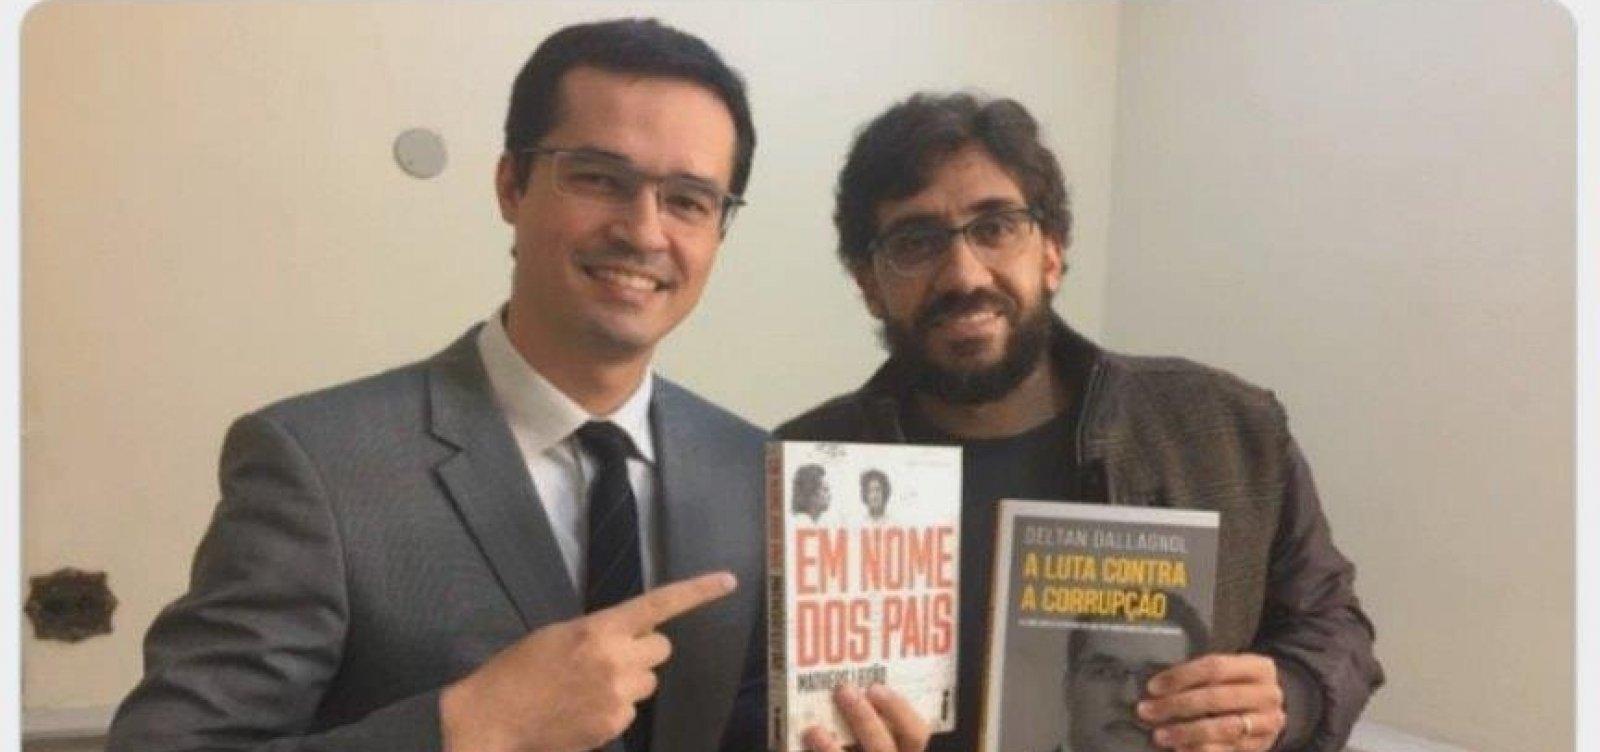 [Bolsonaro compartilha mensagem que chama Deltan de 'esquerdista estilo PSOL']